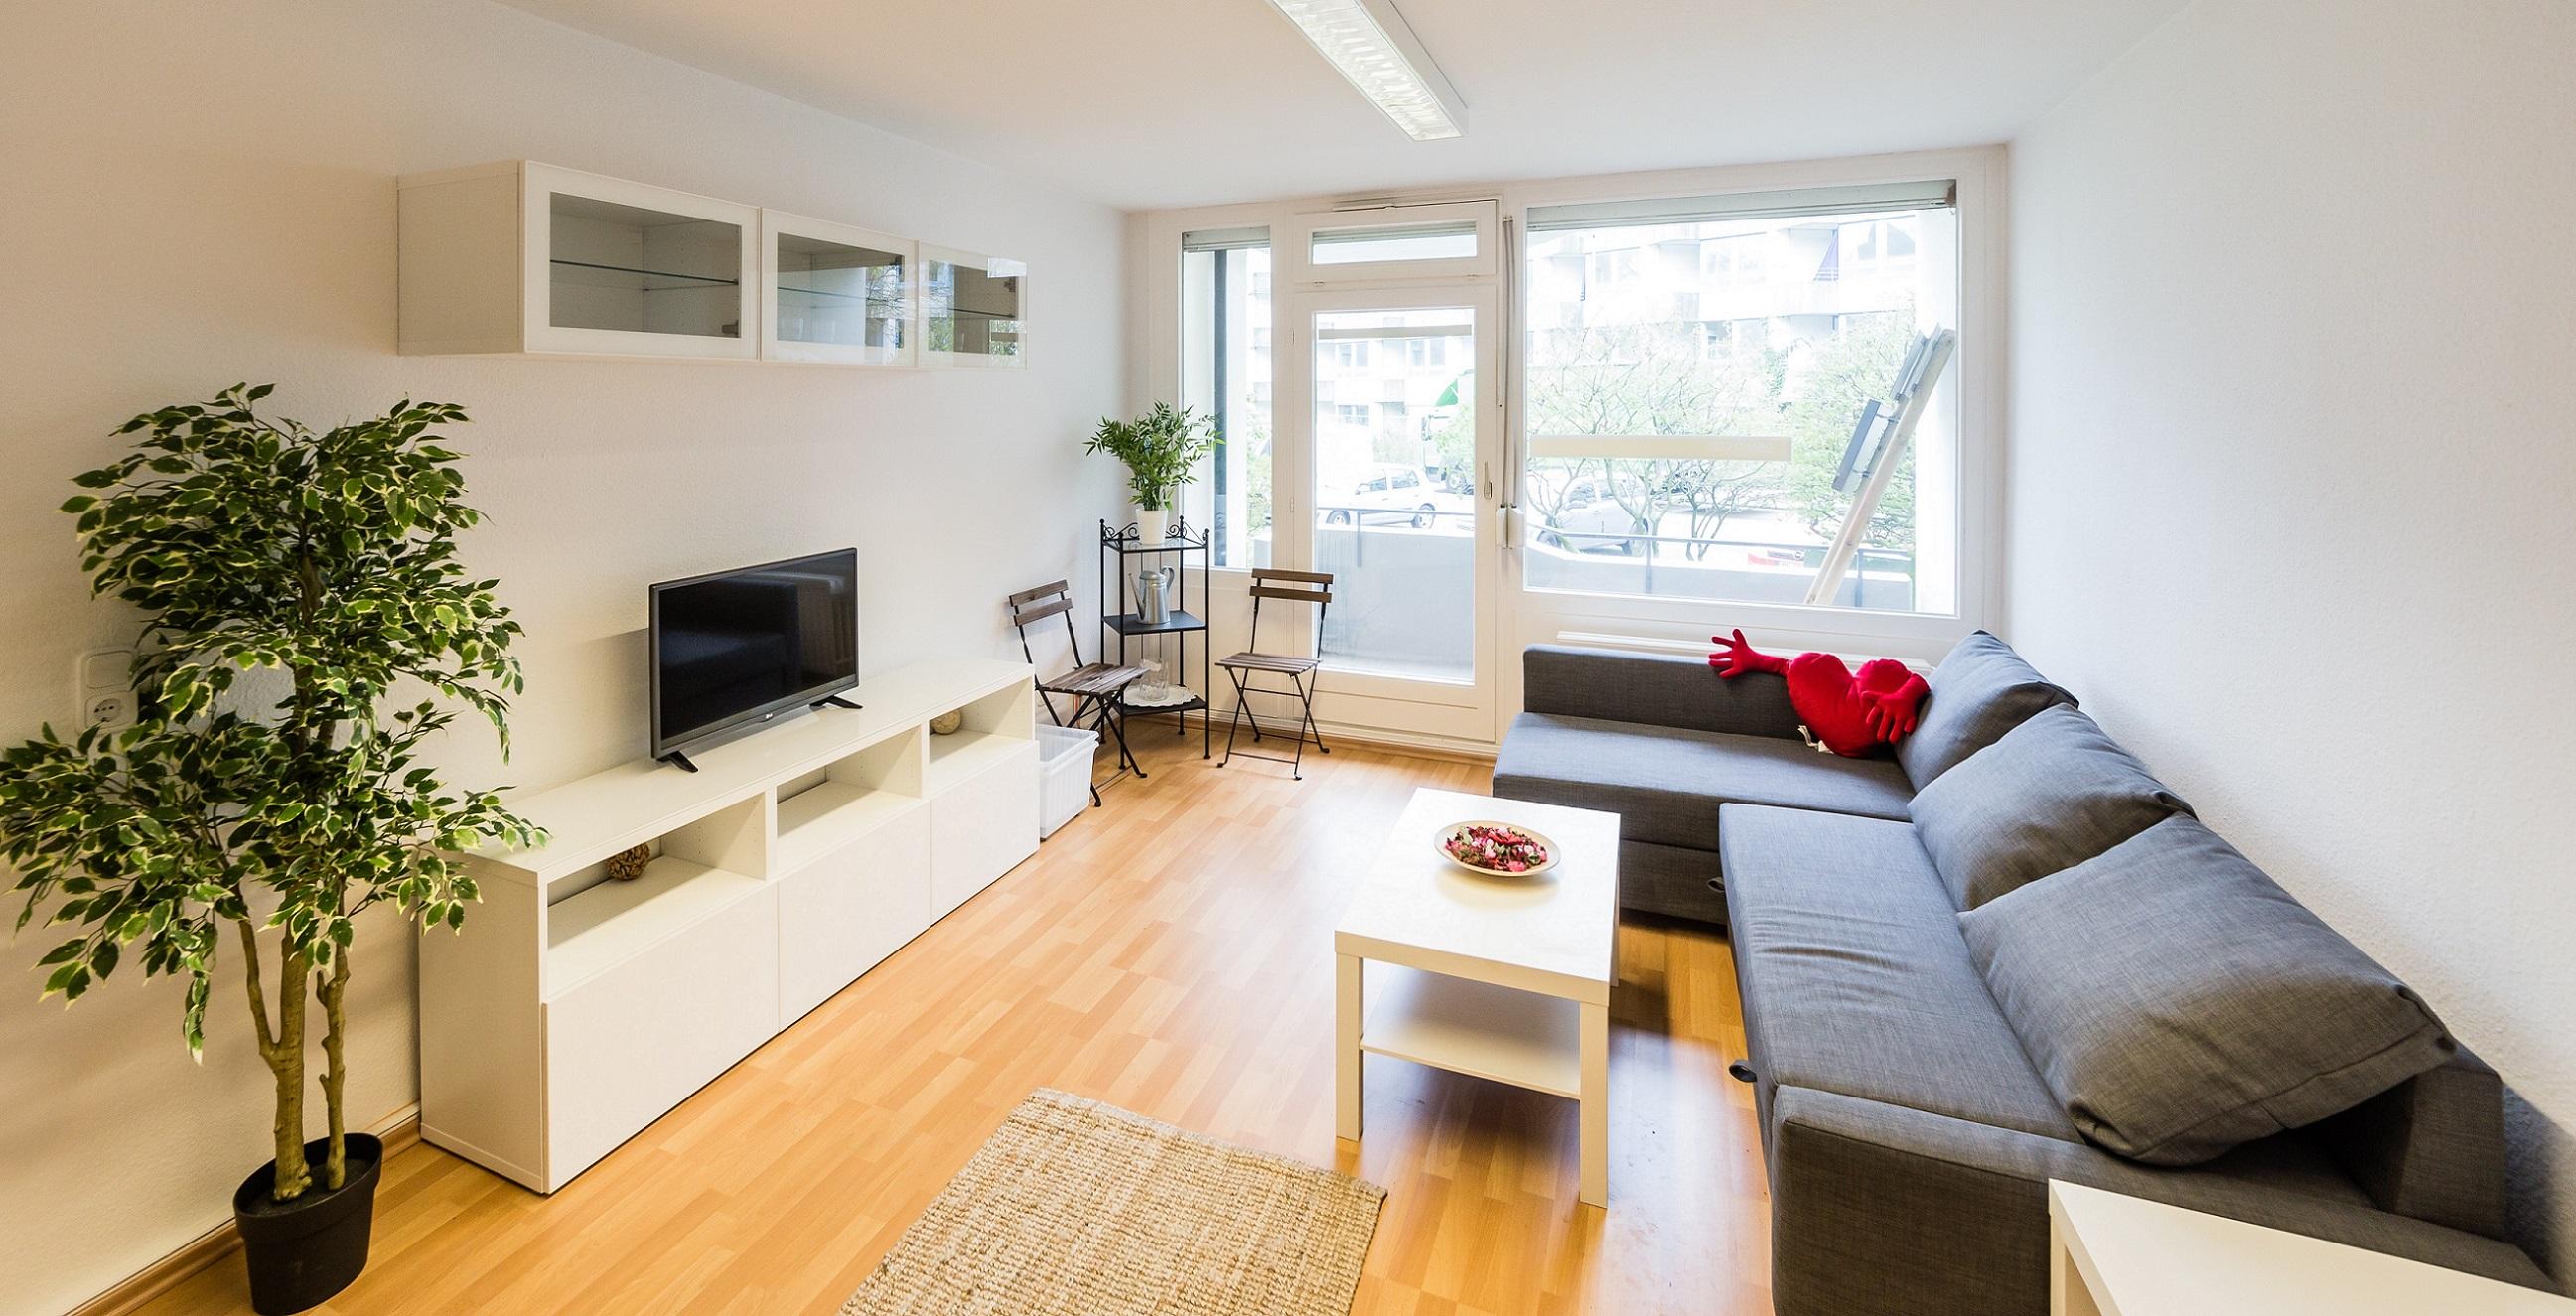 hereinspaziert musterwohnung in delmenhorst er ffnet grand city property gcp. Black Bedroom Furniture Sets. Home Design Ideas